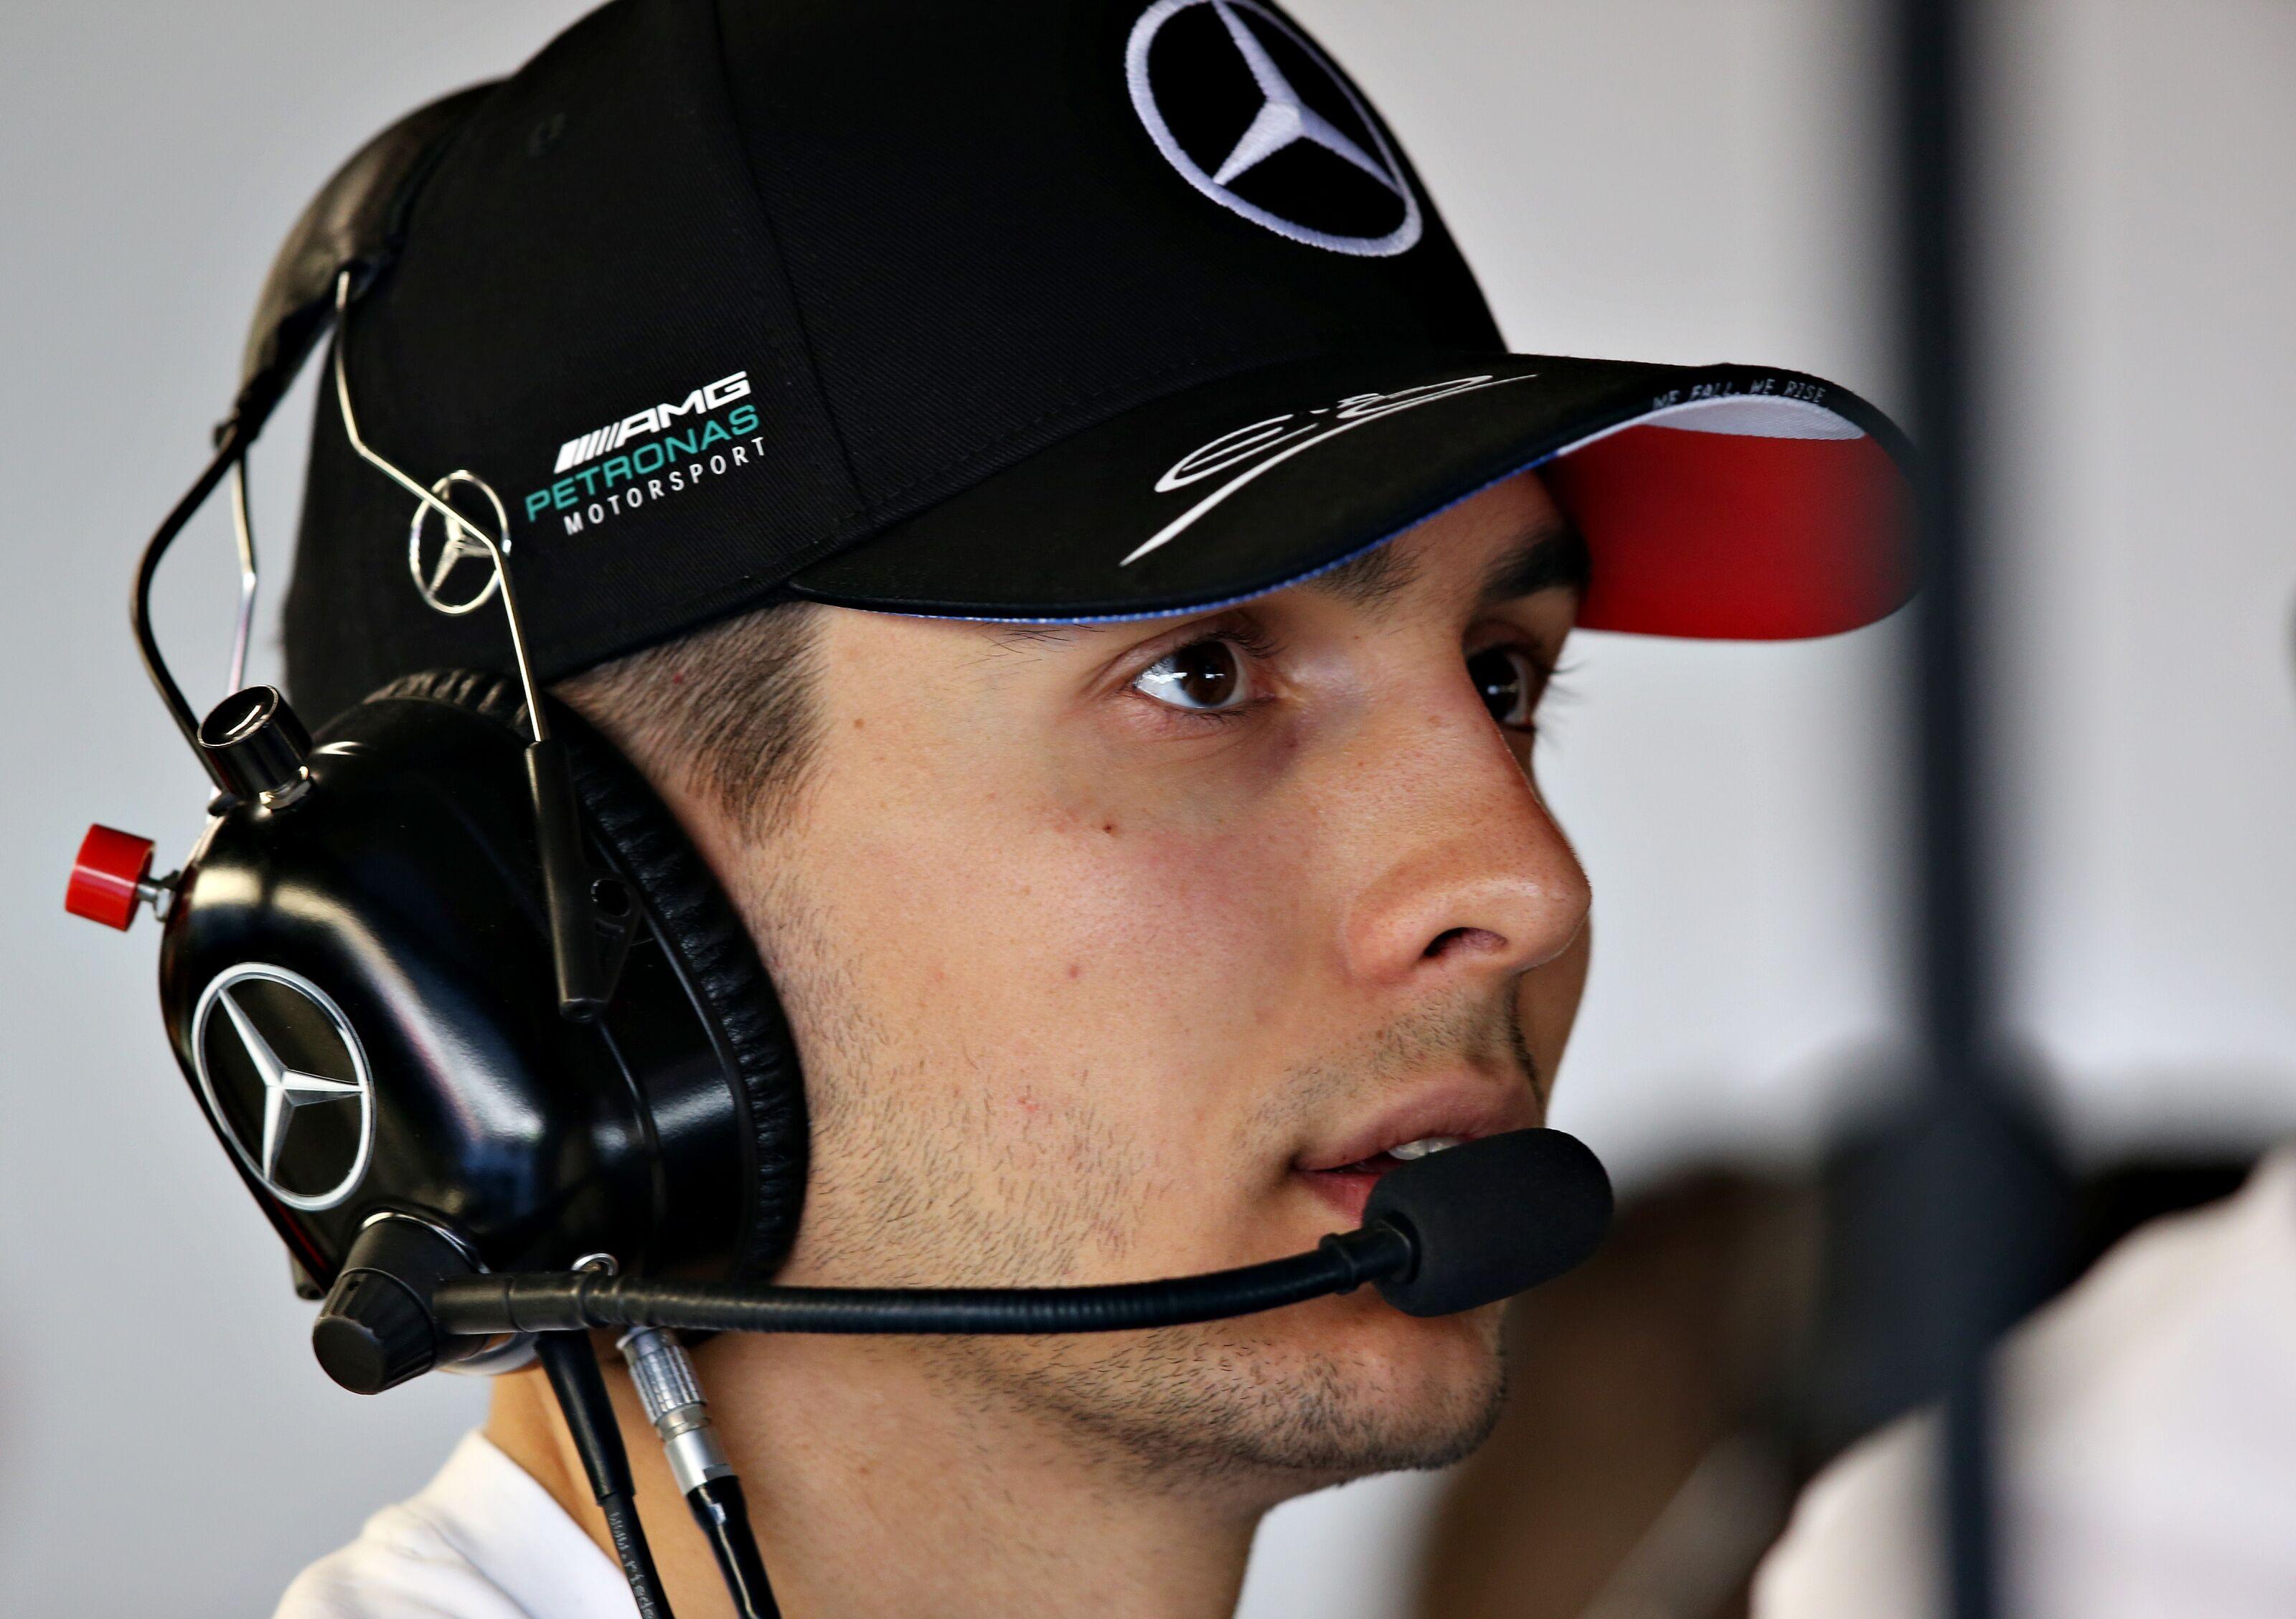 Formula 1: Esteban Ocon tipped to replace Nico Hulkenberg at Renault in 2020